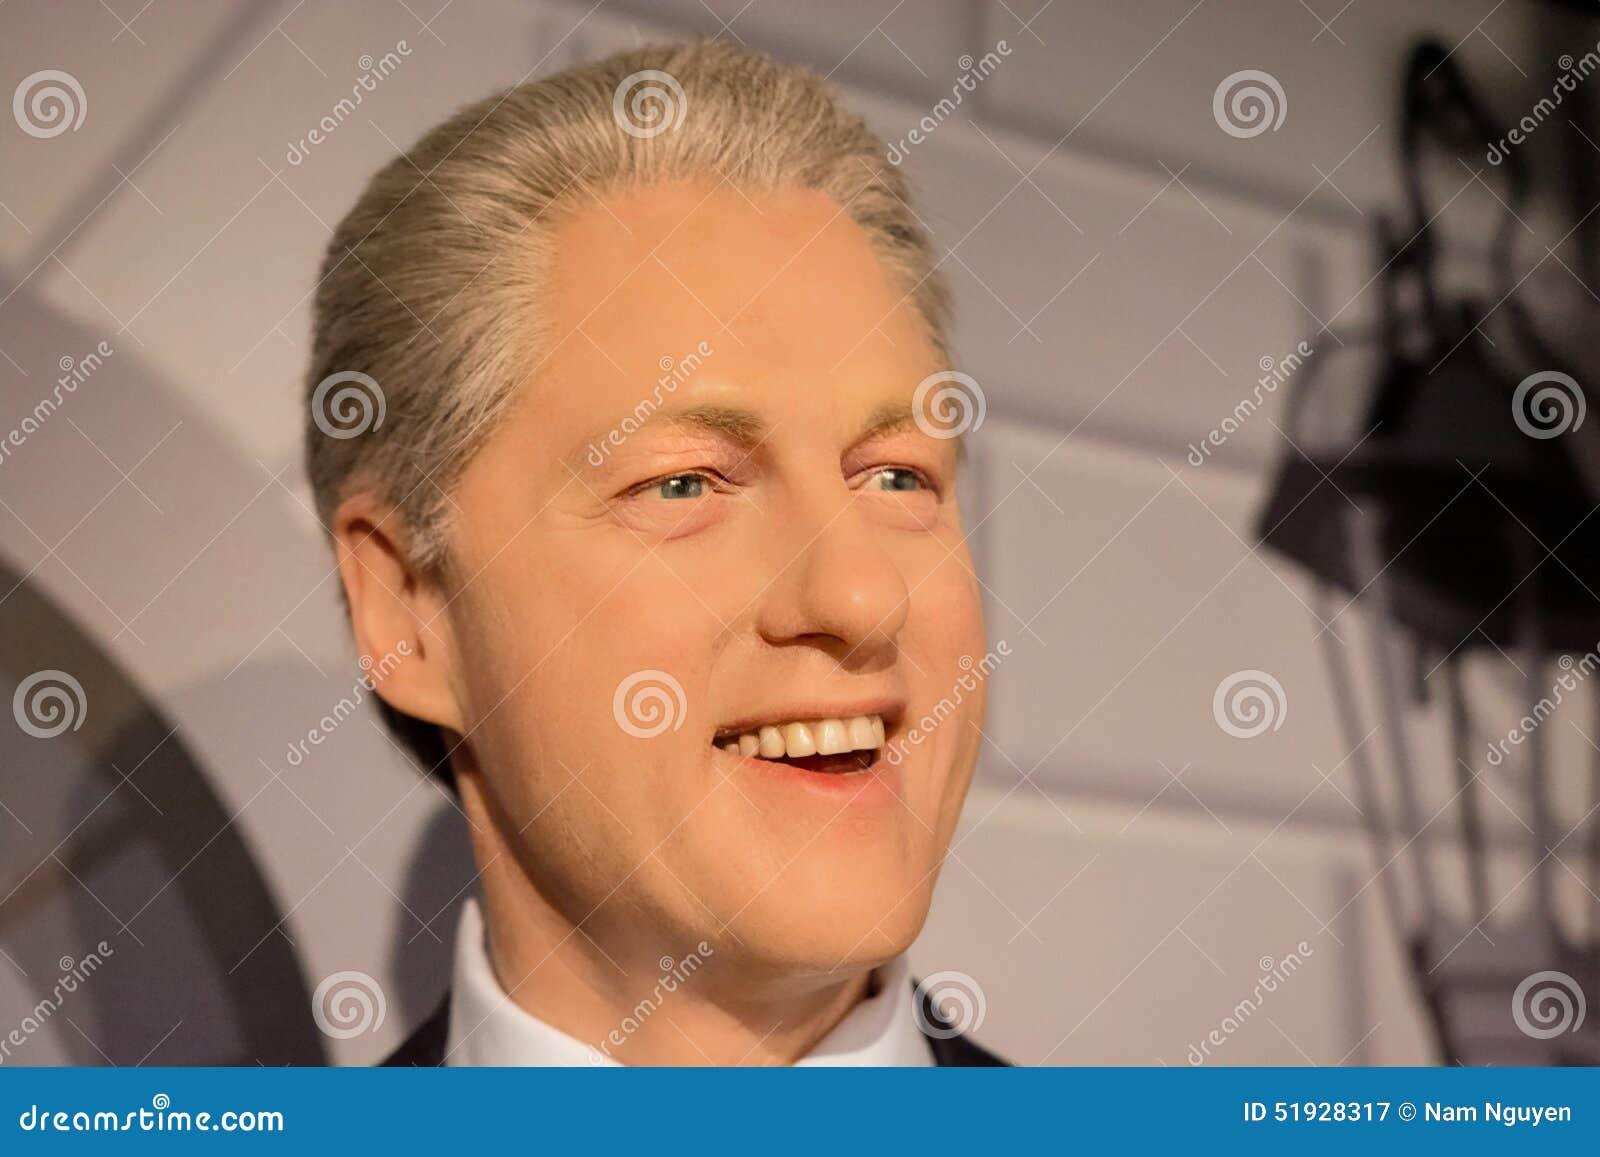 Bill Clinton Wax Figure